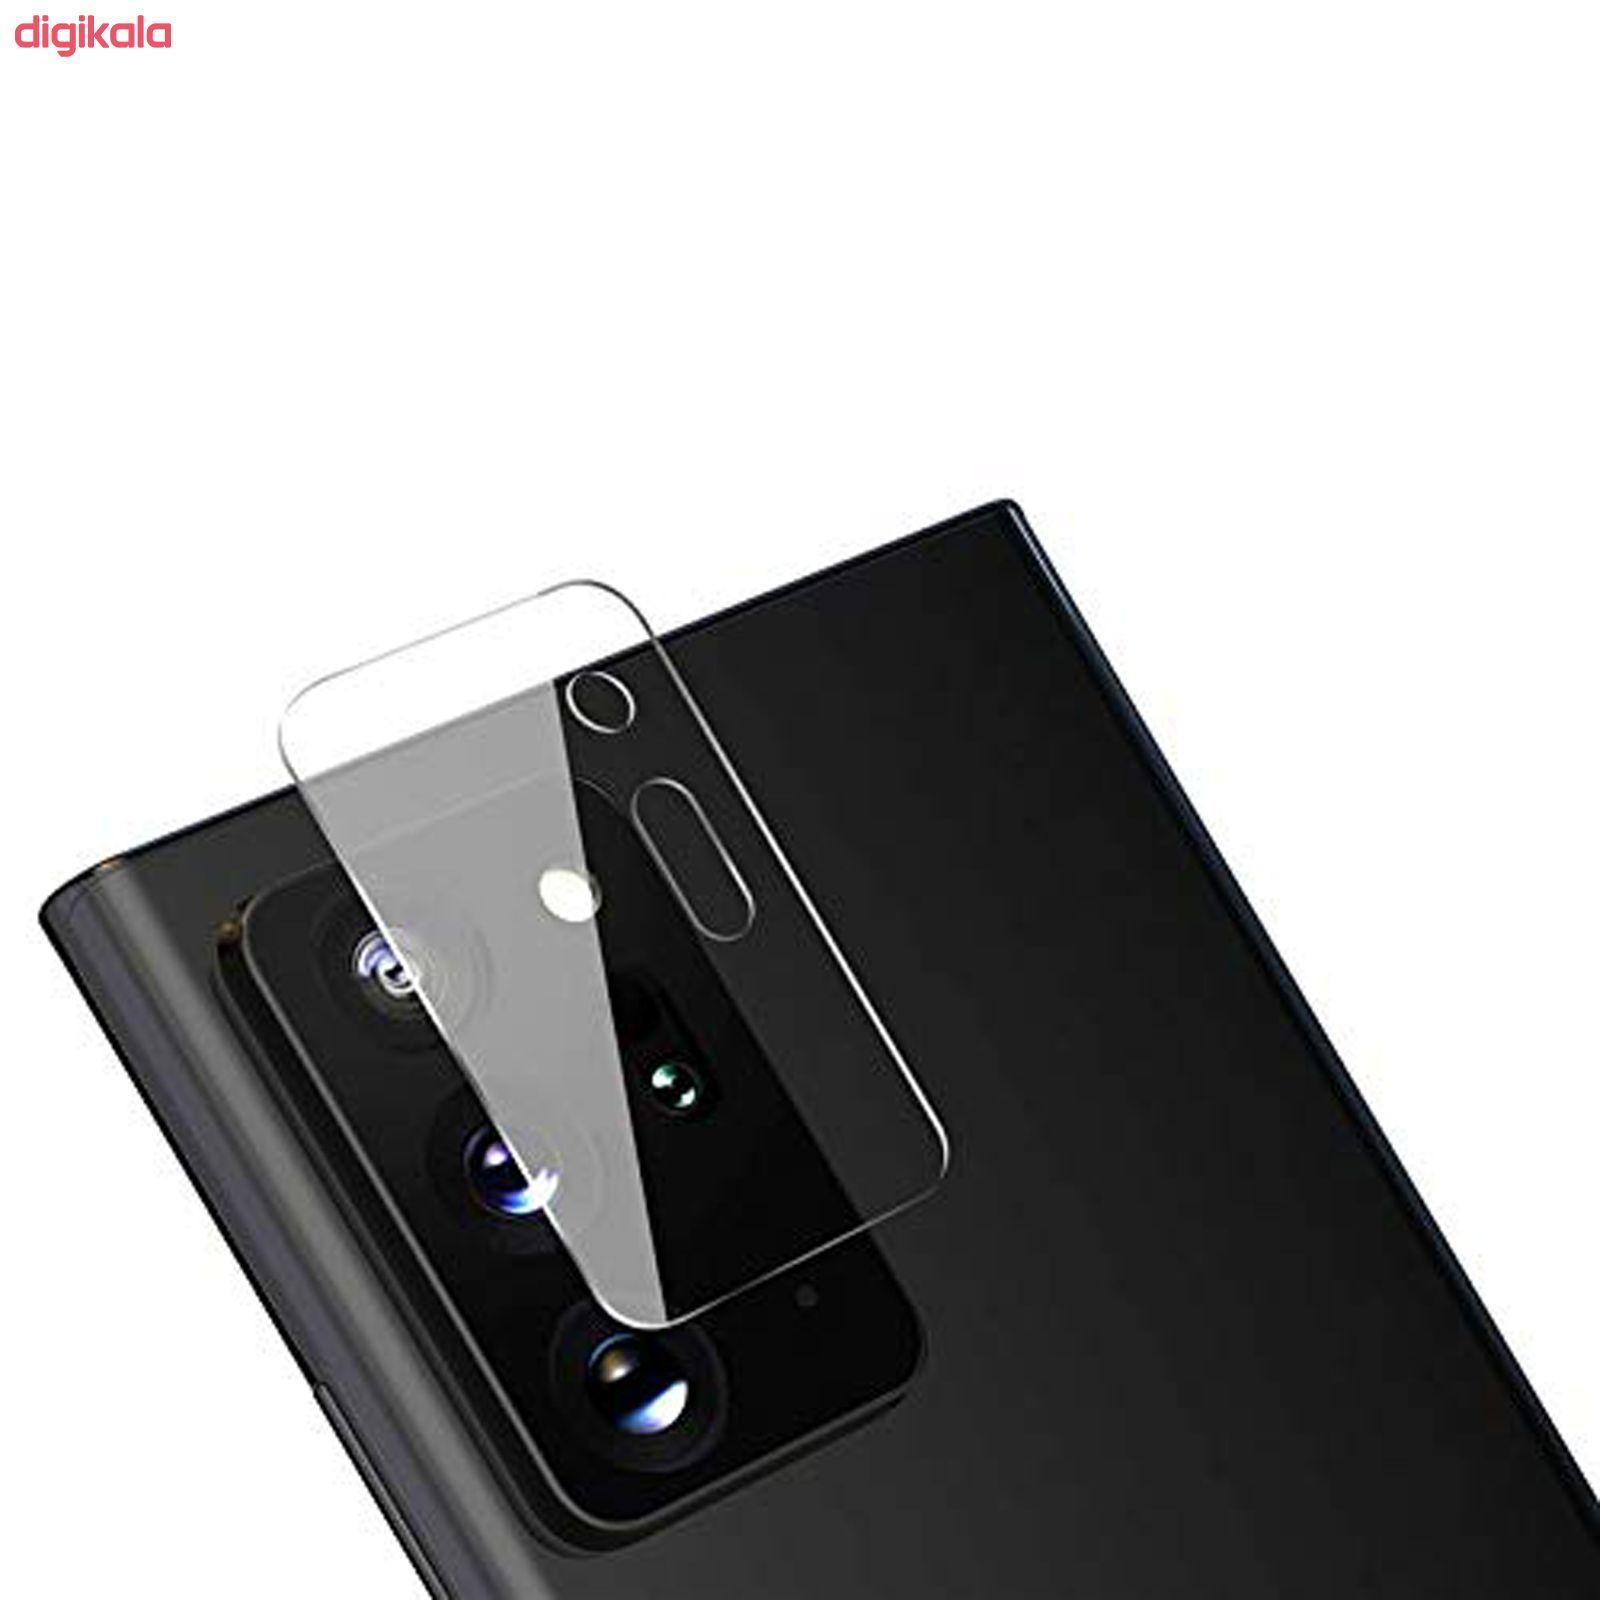 محافظ لنز دوربین سیحان مدل GLP مناسب برای گوشی موبایل سامسونگ Galaxy Note 20 main 1 3